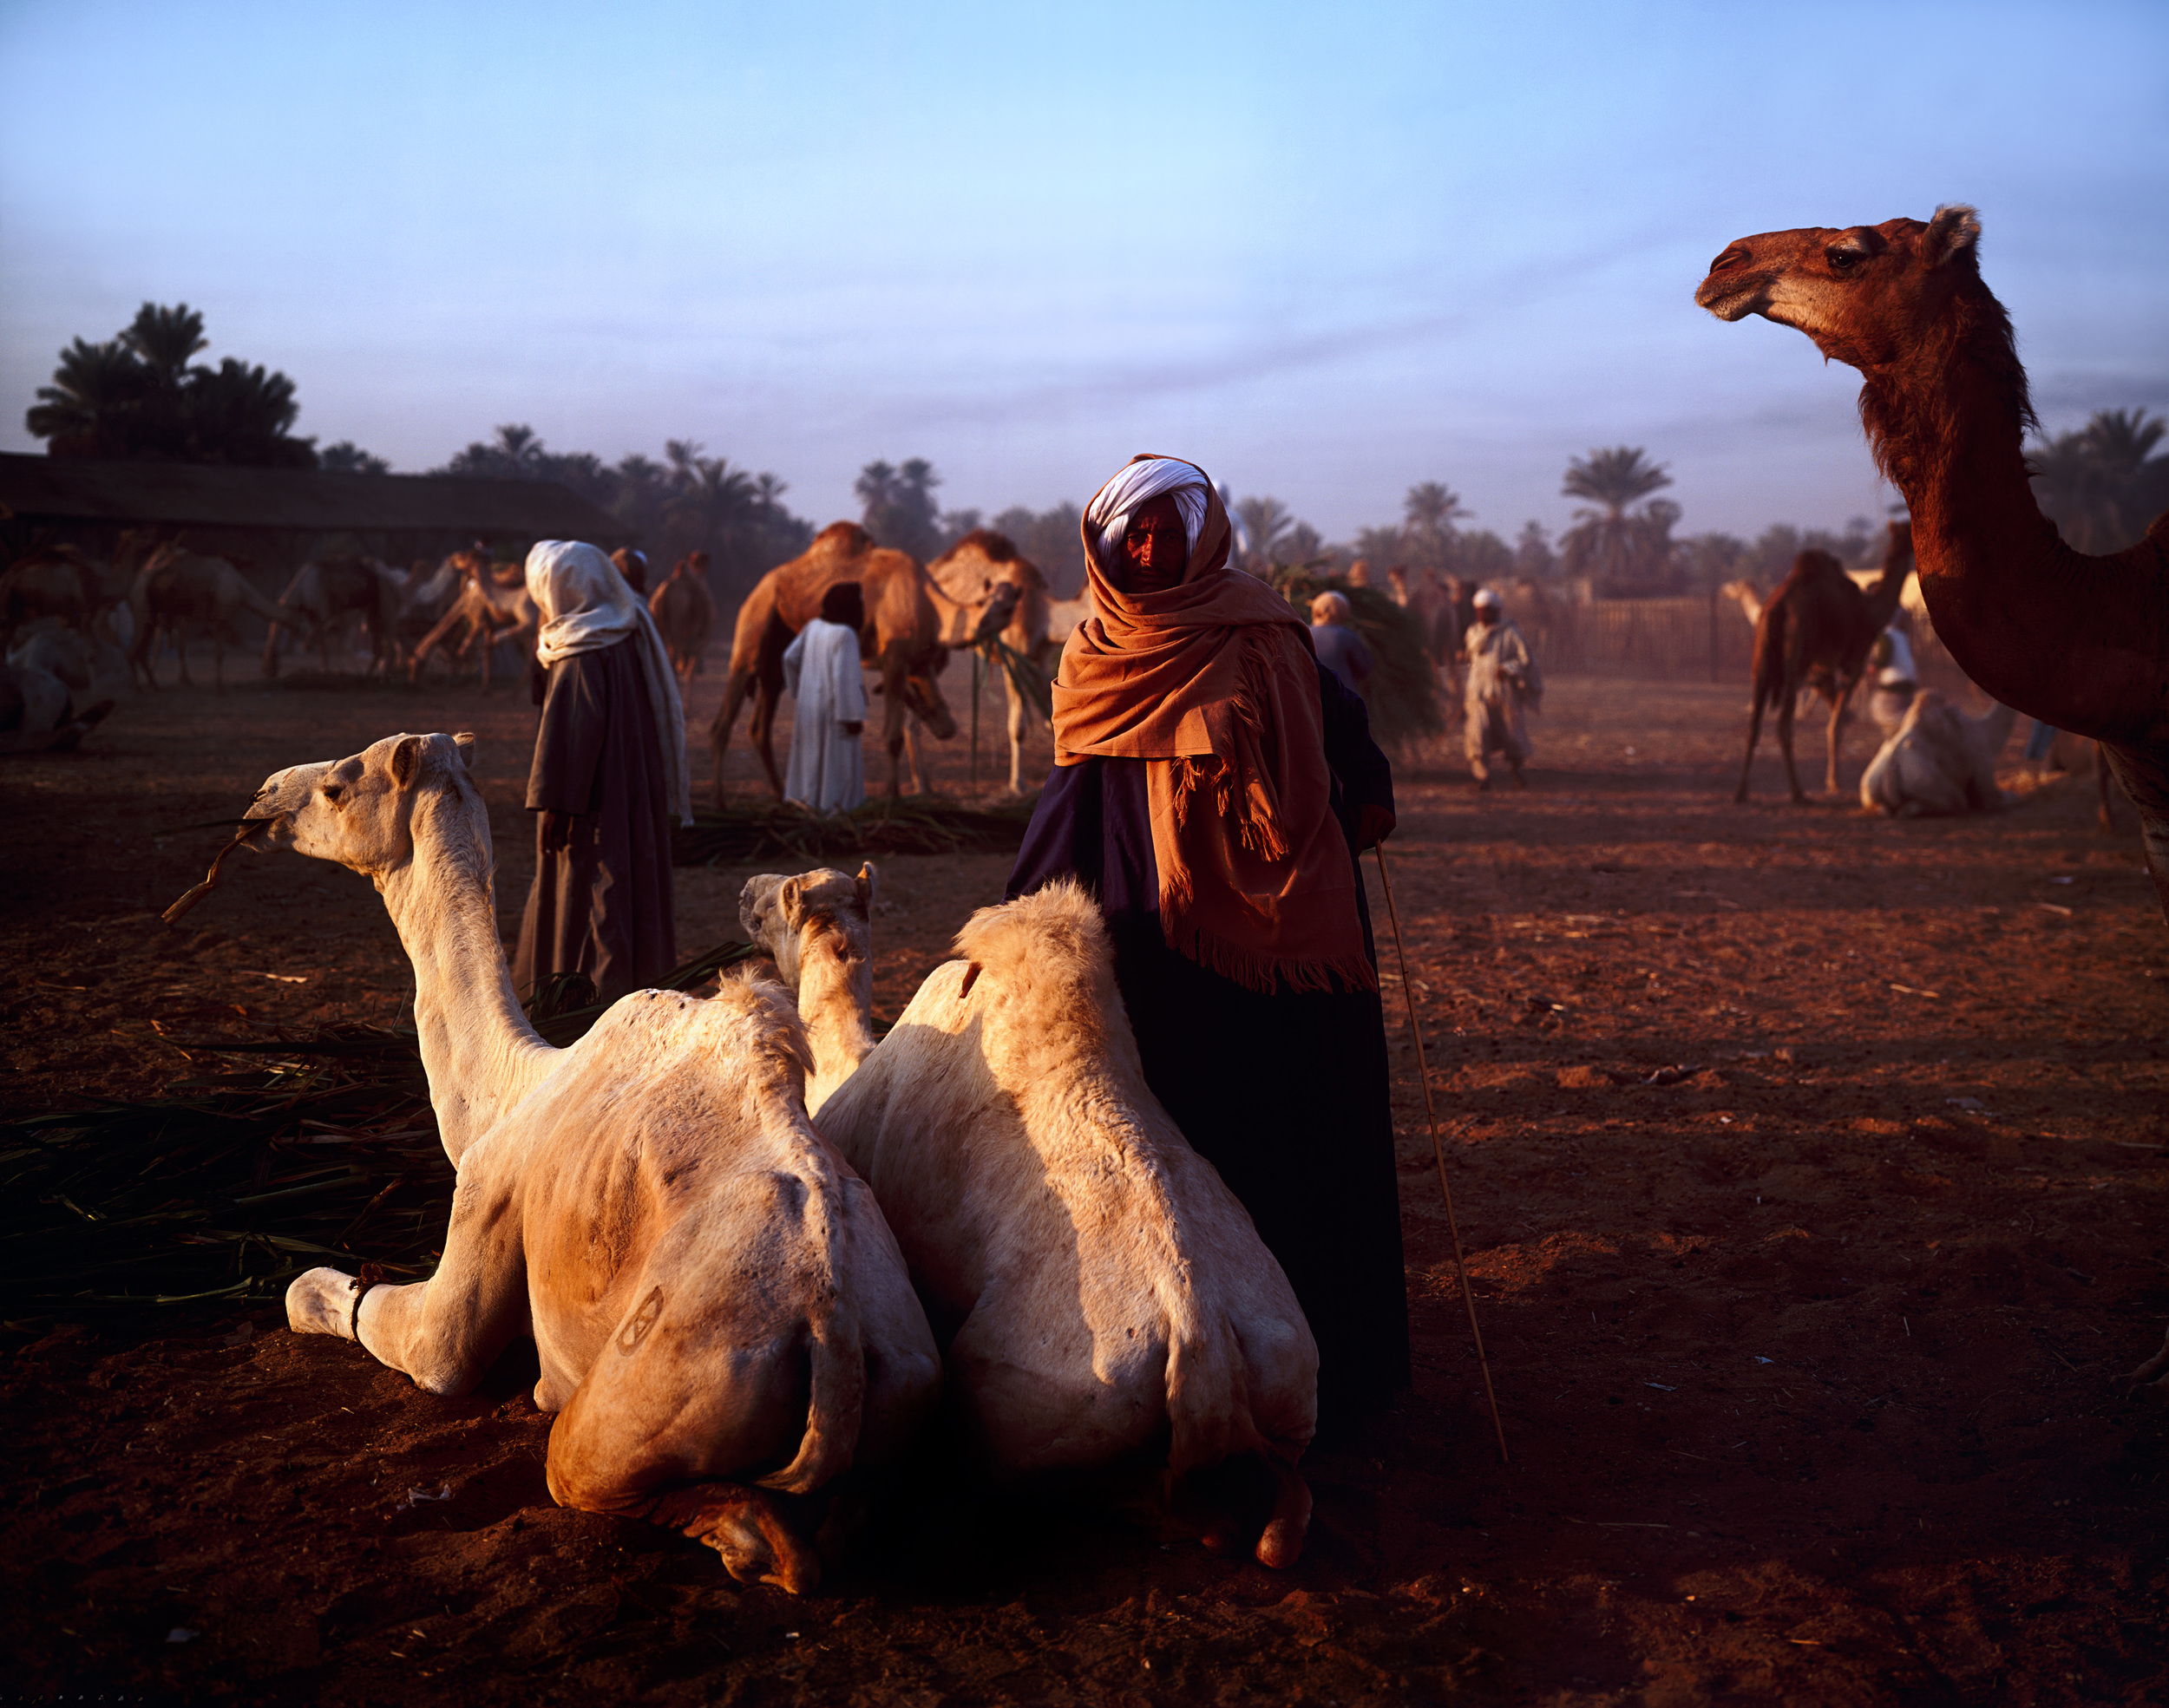 Darawa Camel Market, Egypt.